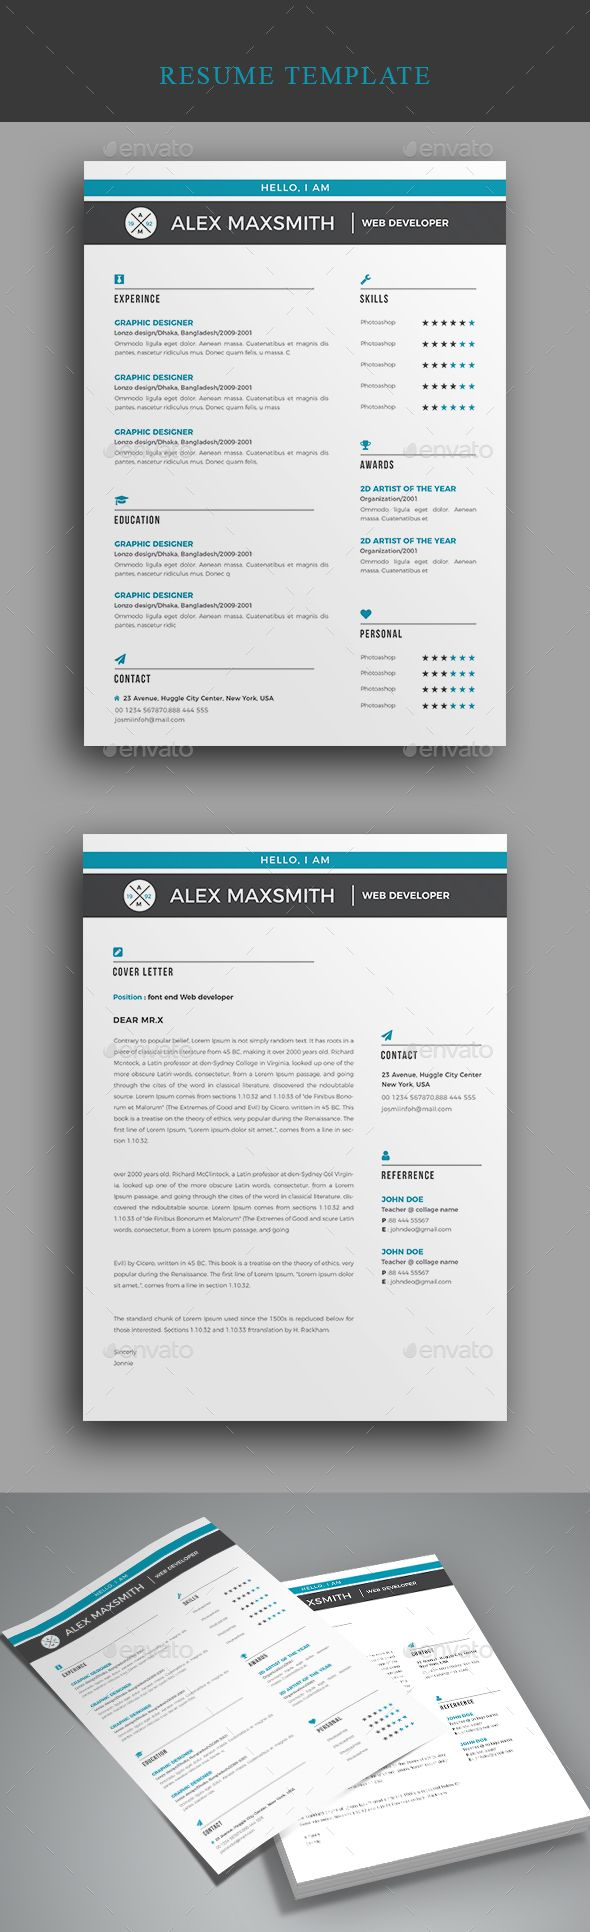 Resume Resumes Stationery Download here httpsgraphicrivernetitem